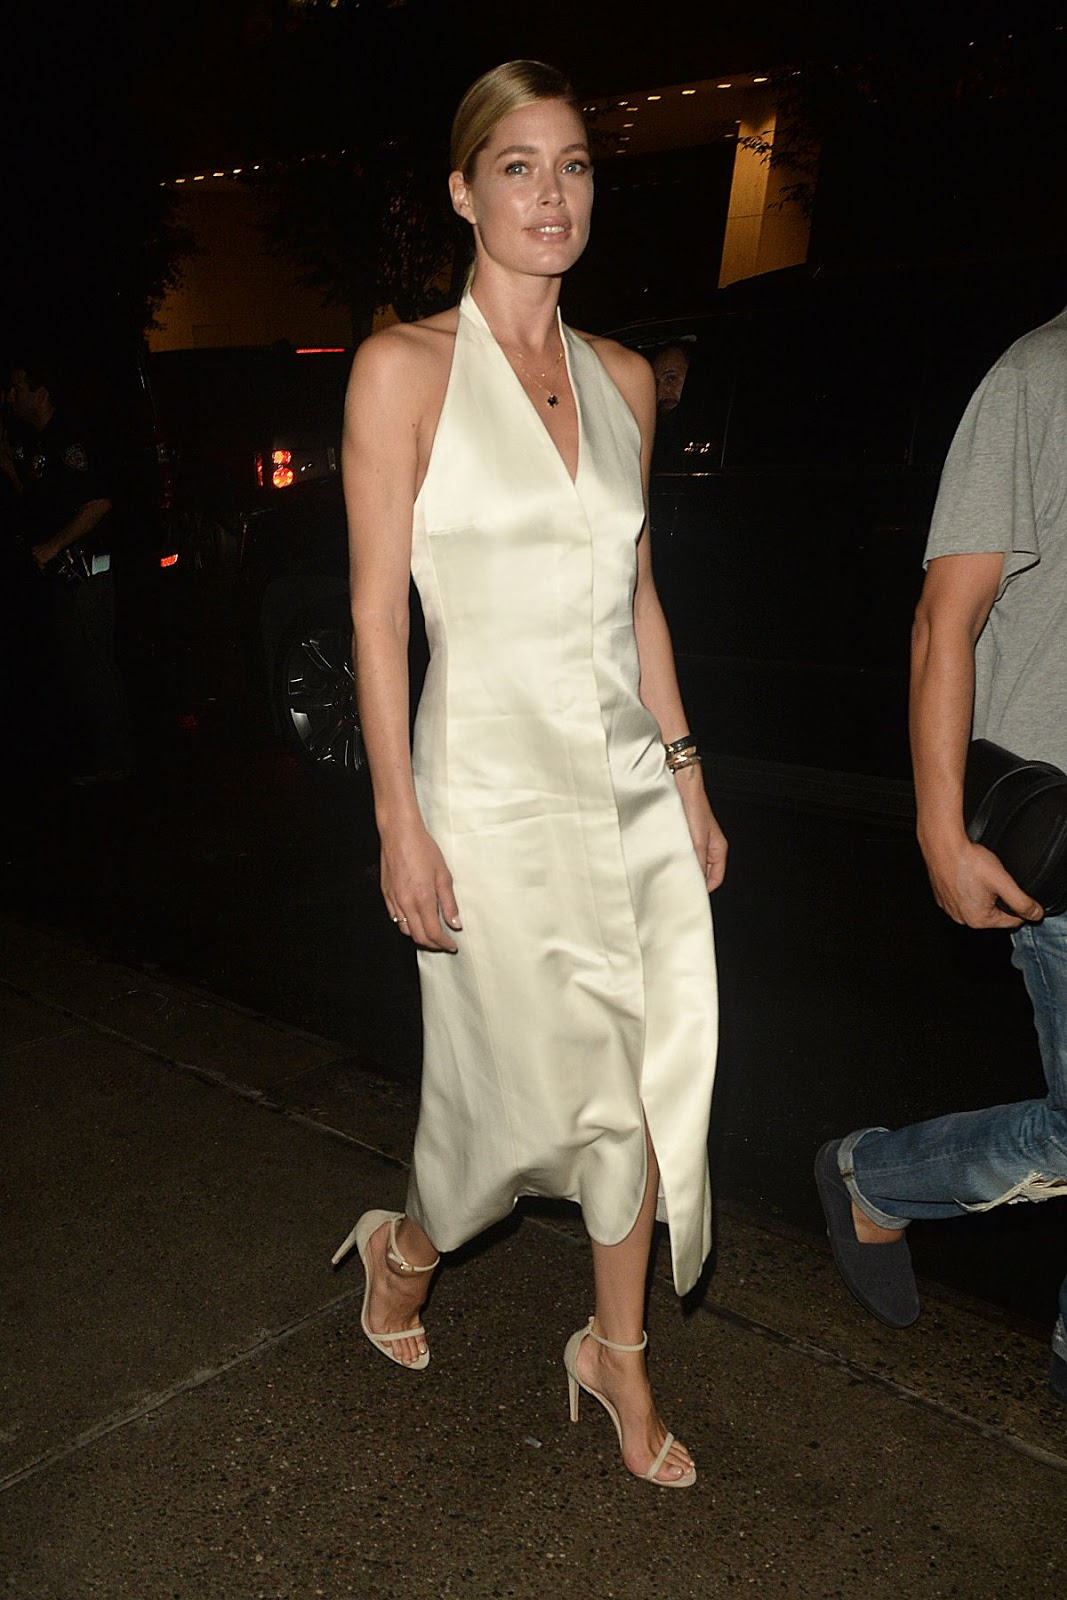 'Wonder Woman' actress Photos Doutzen Kroes At Harper's Bazaar Celebrates Icons By Carine Roitfeld, NY City